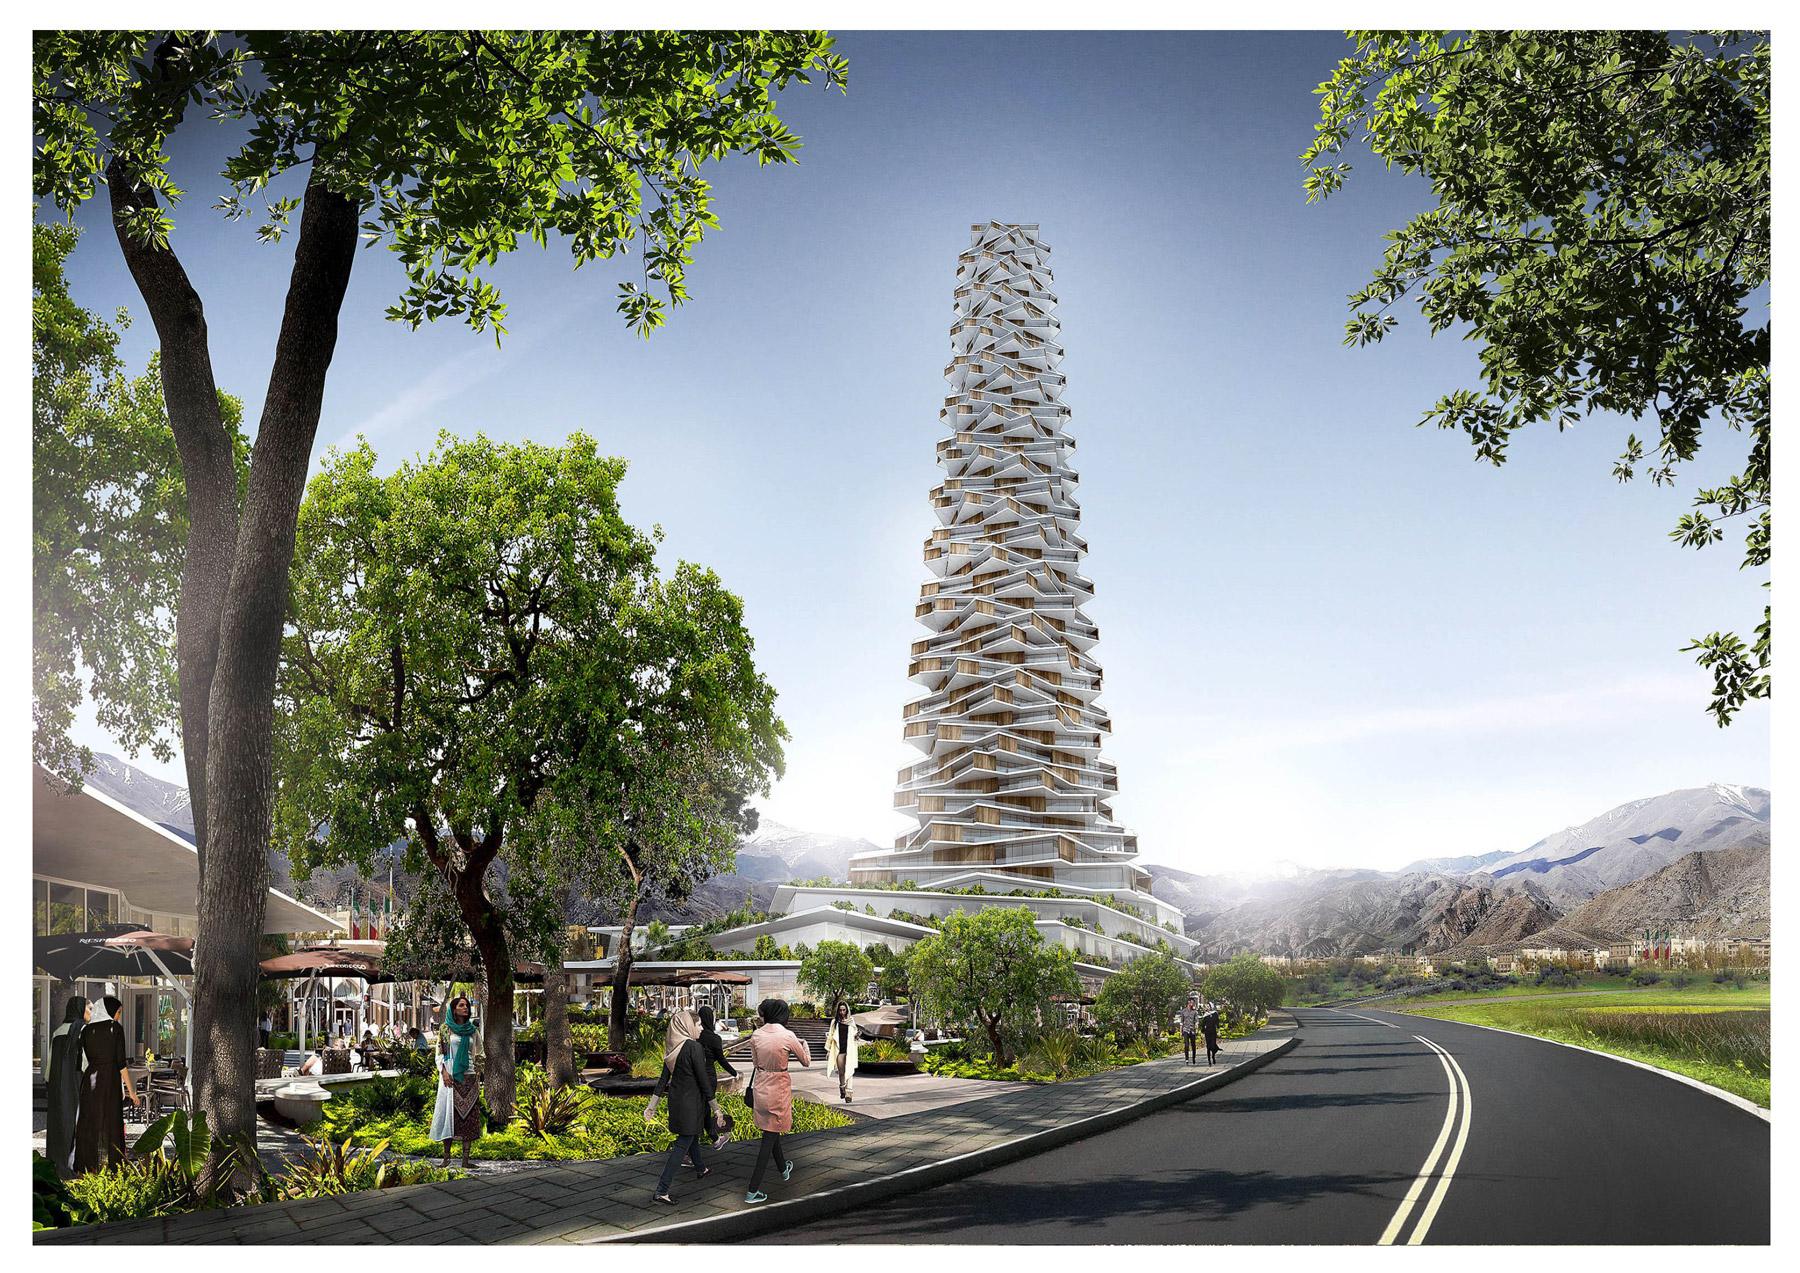 302_Hamadan_Green_tower_slide_01